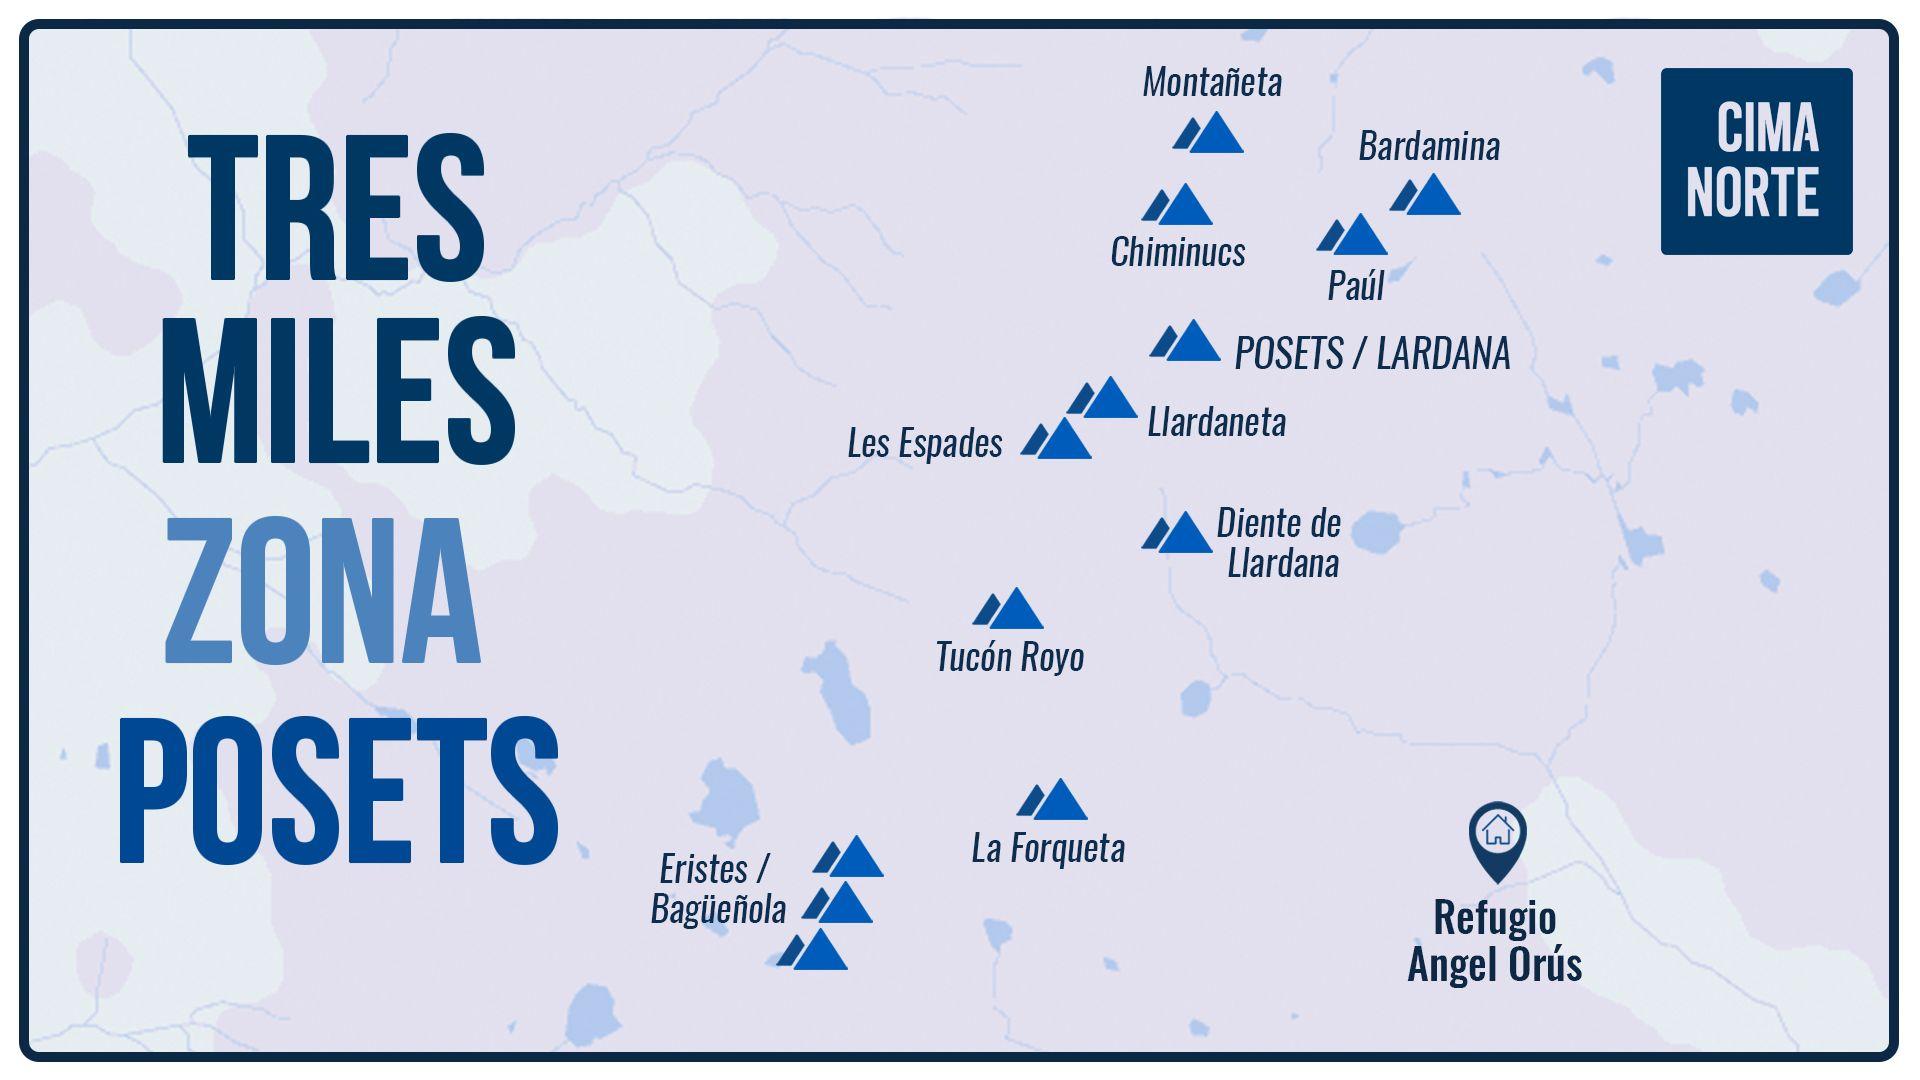 mapa infografía tresmiles posets eriste pirineo